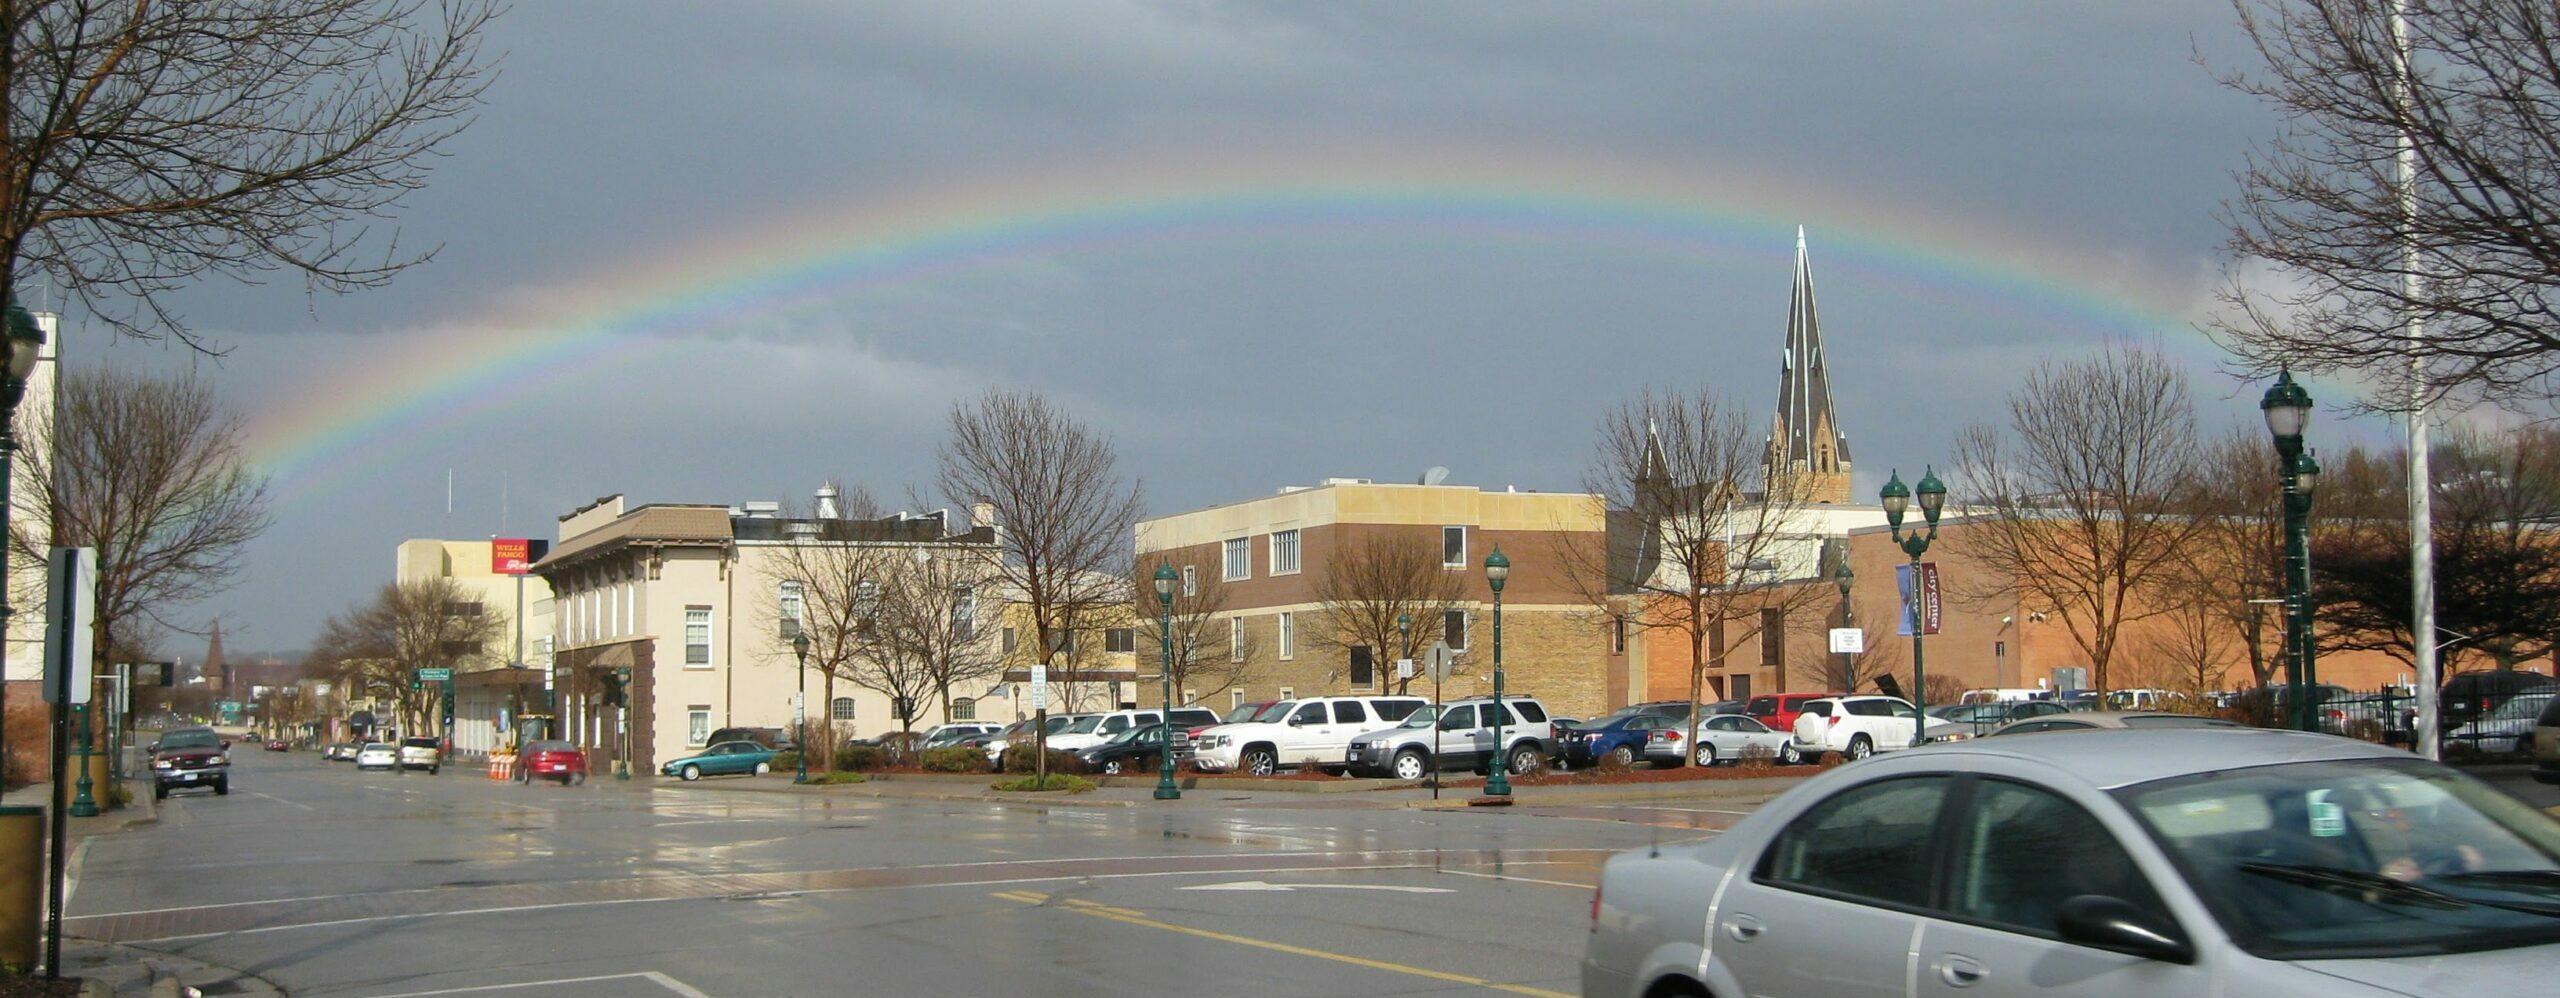 Rainbow over downtown Mankato